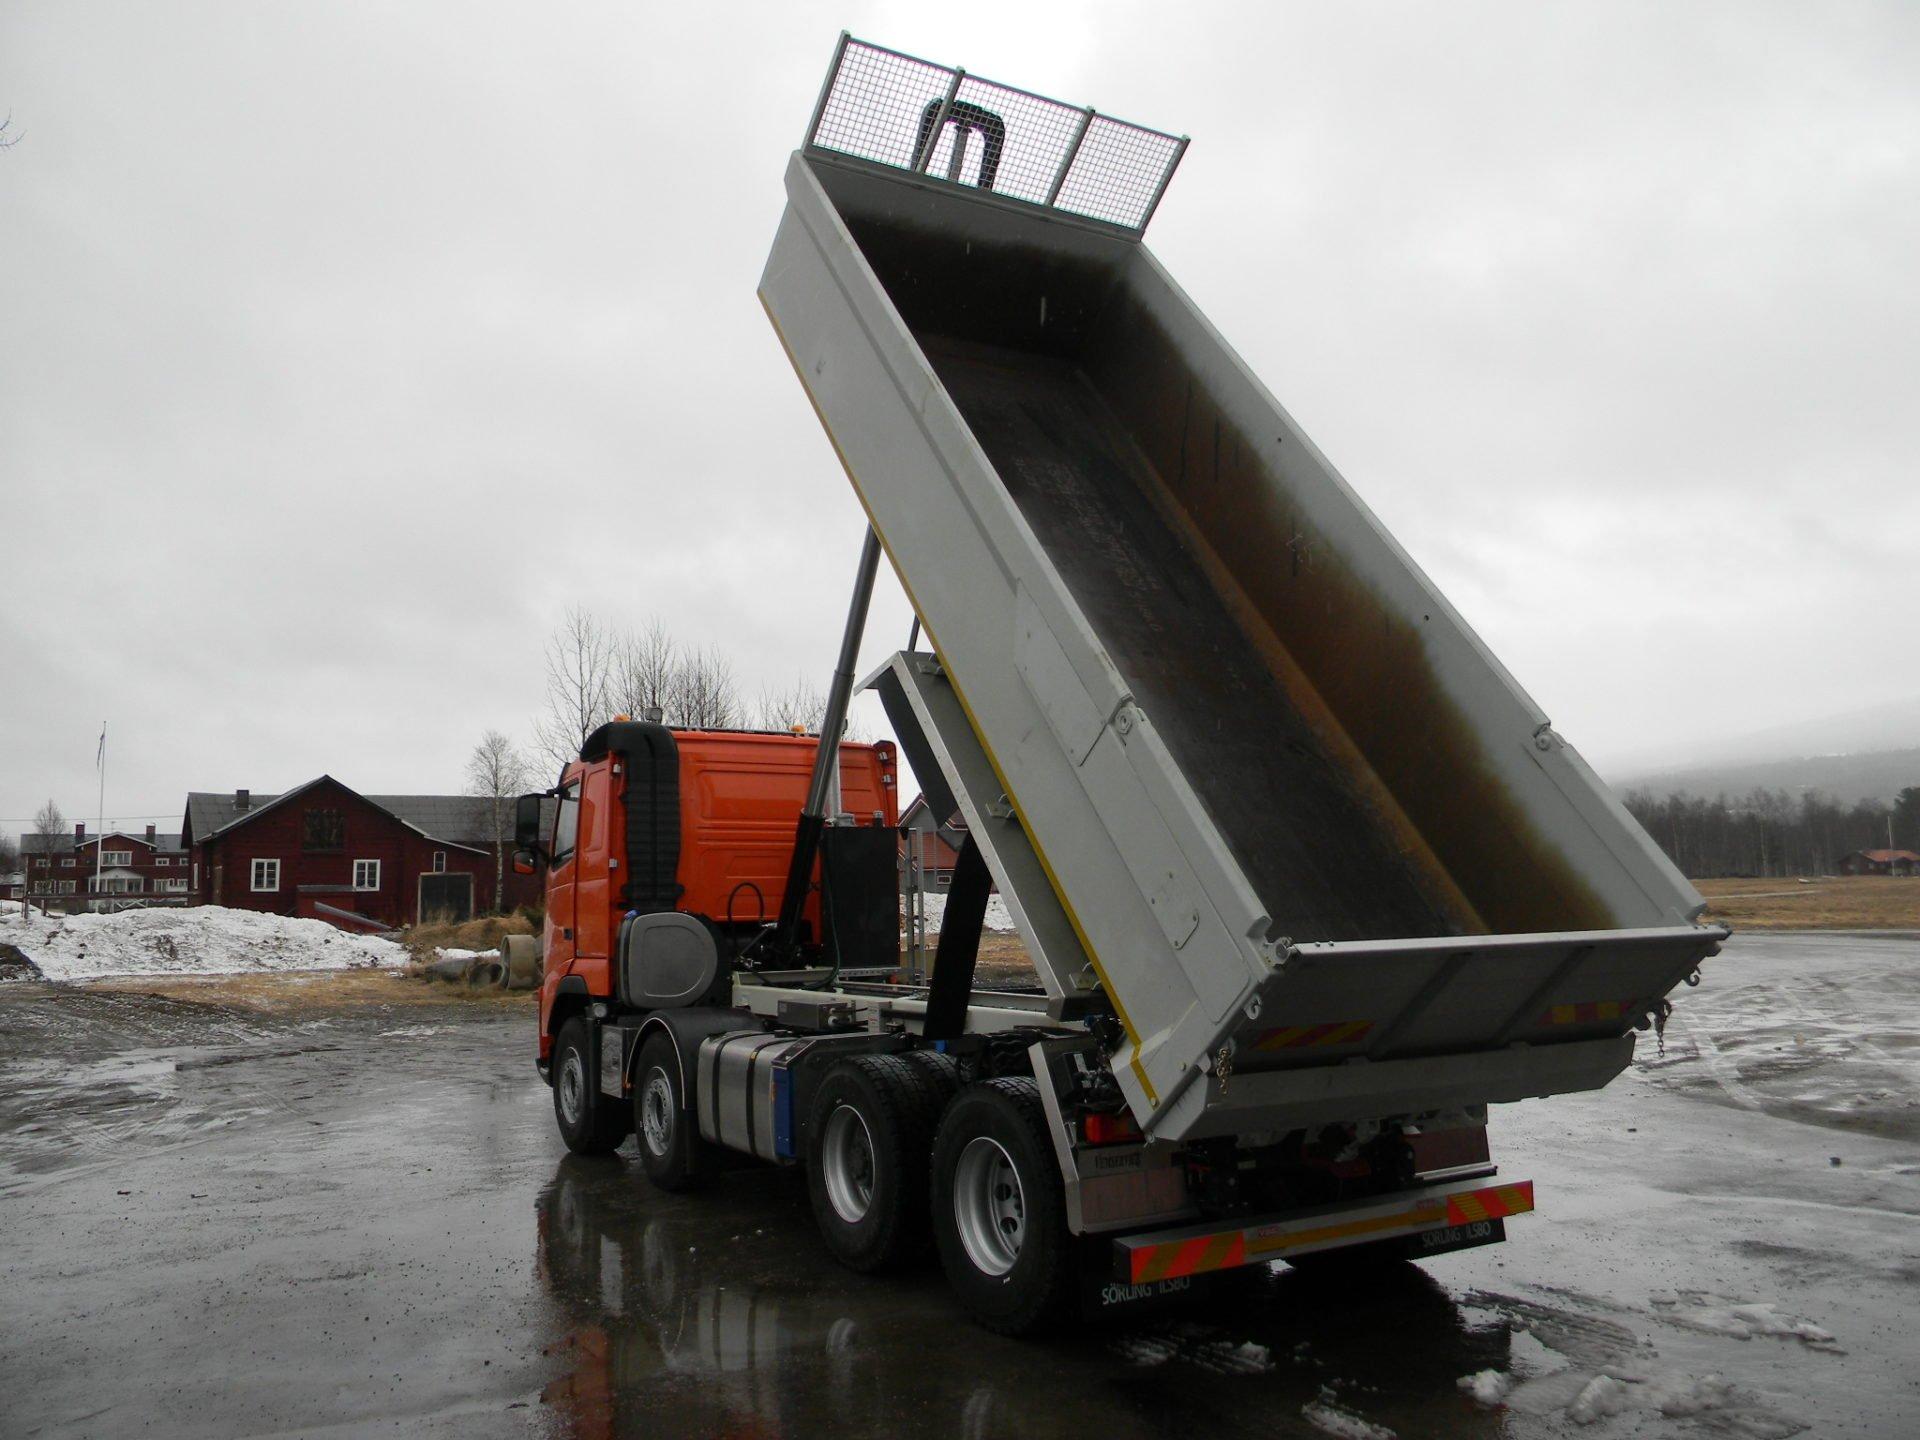 1216354 Gustavssons åkeri (7)